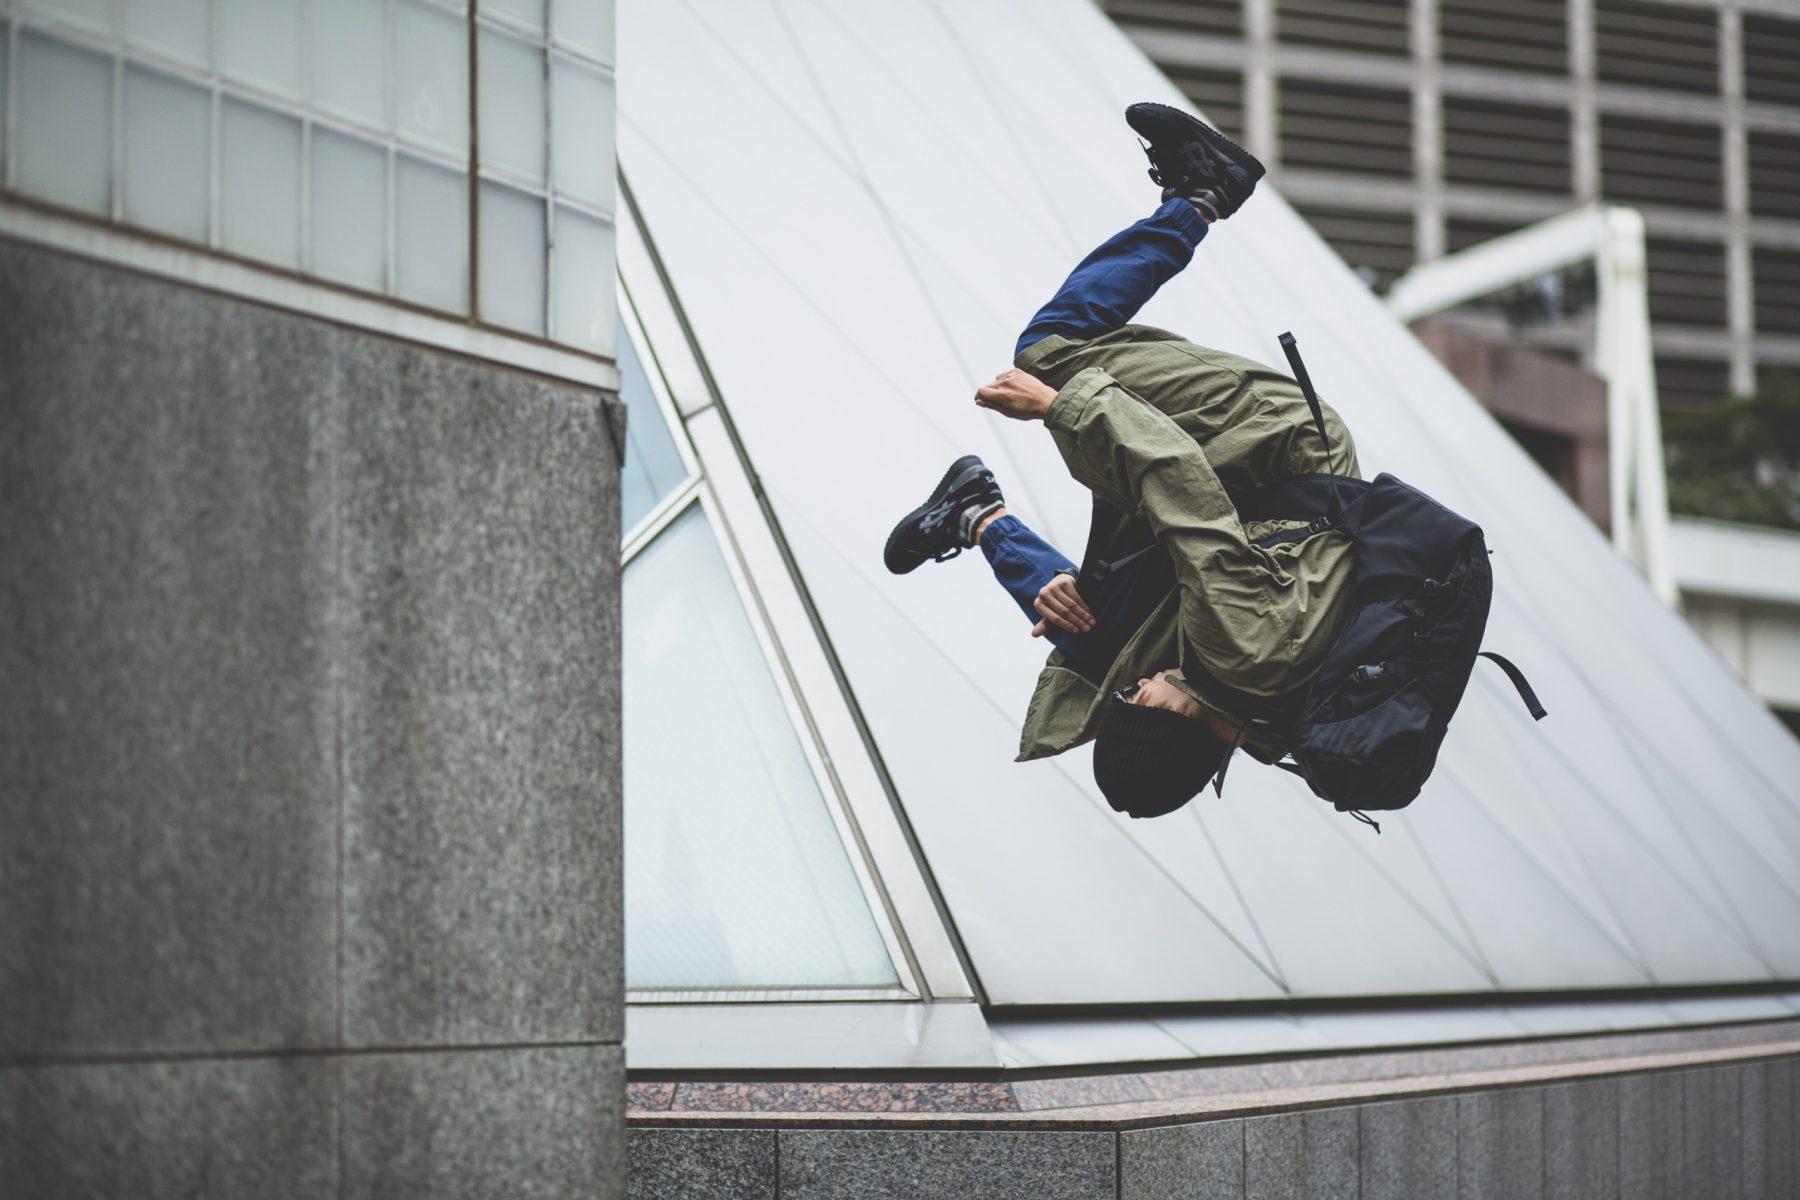 ScottBass-BriefingBags-BRFG-Tokyo-8